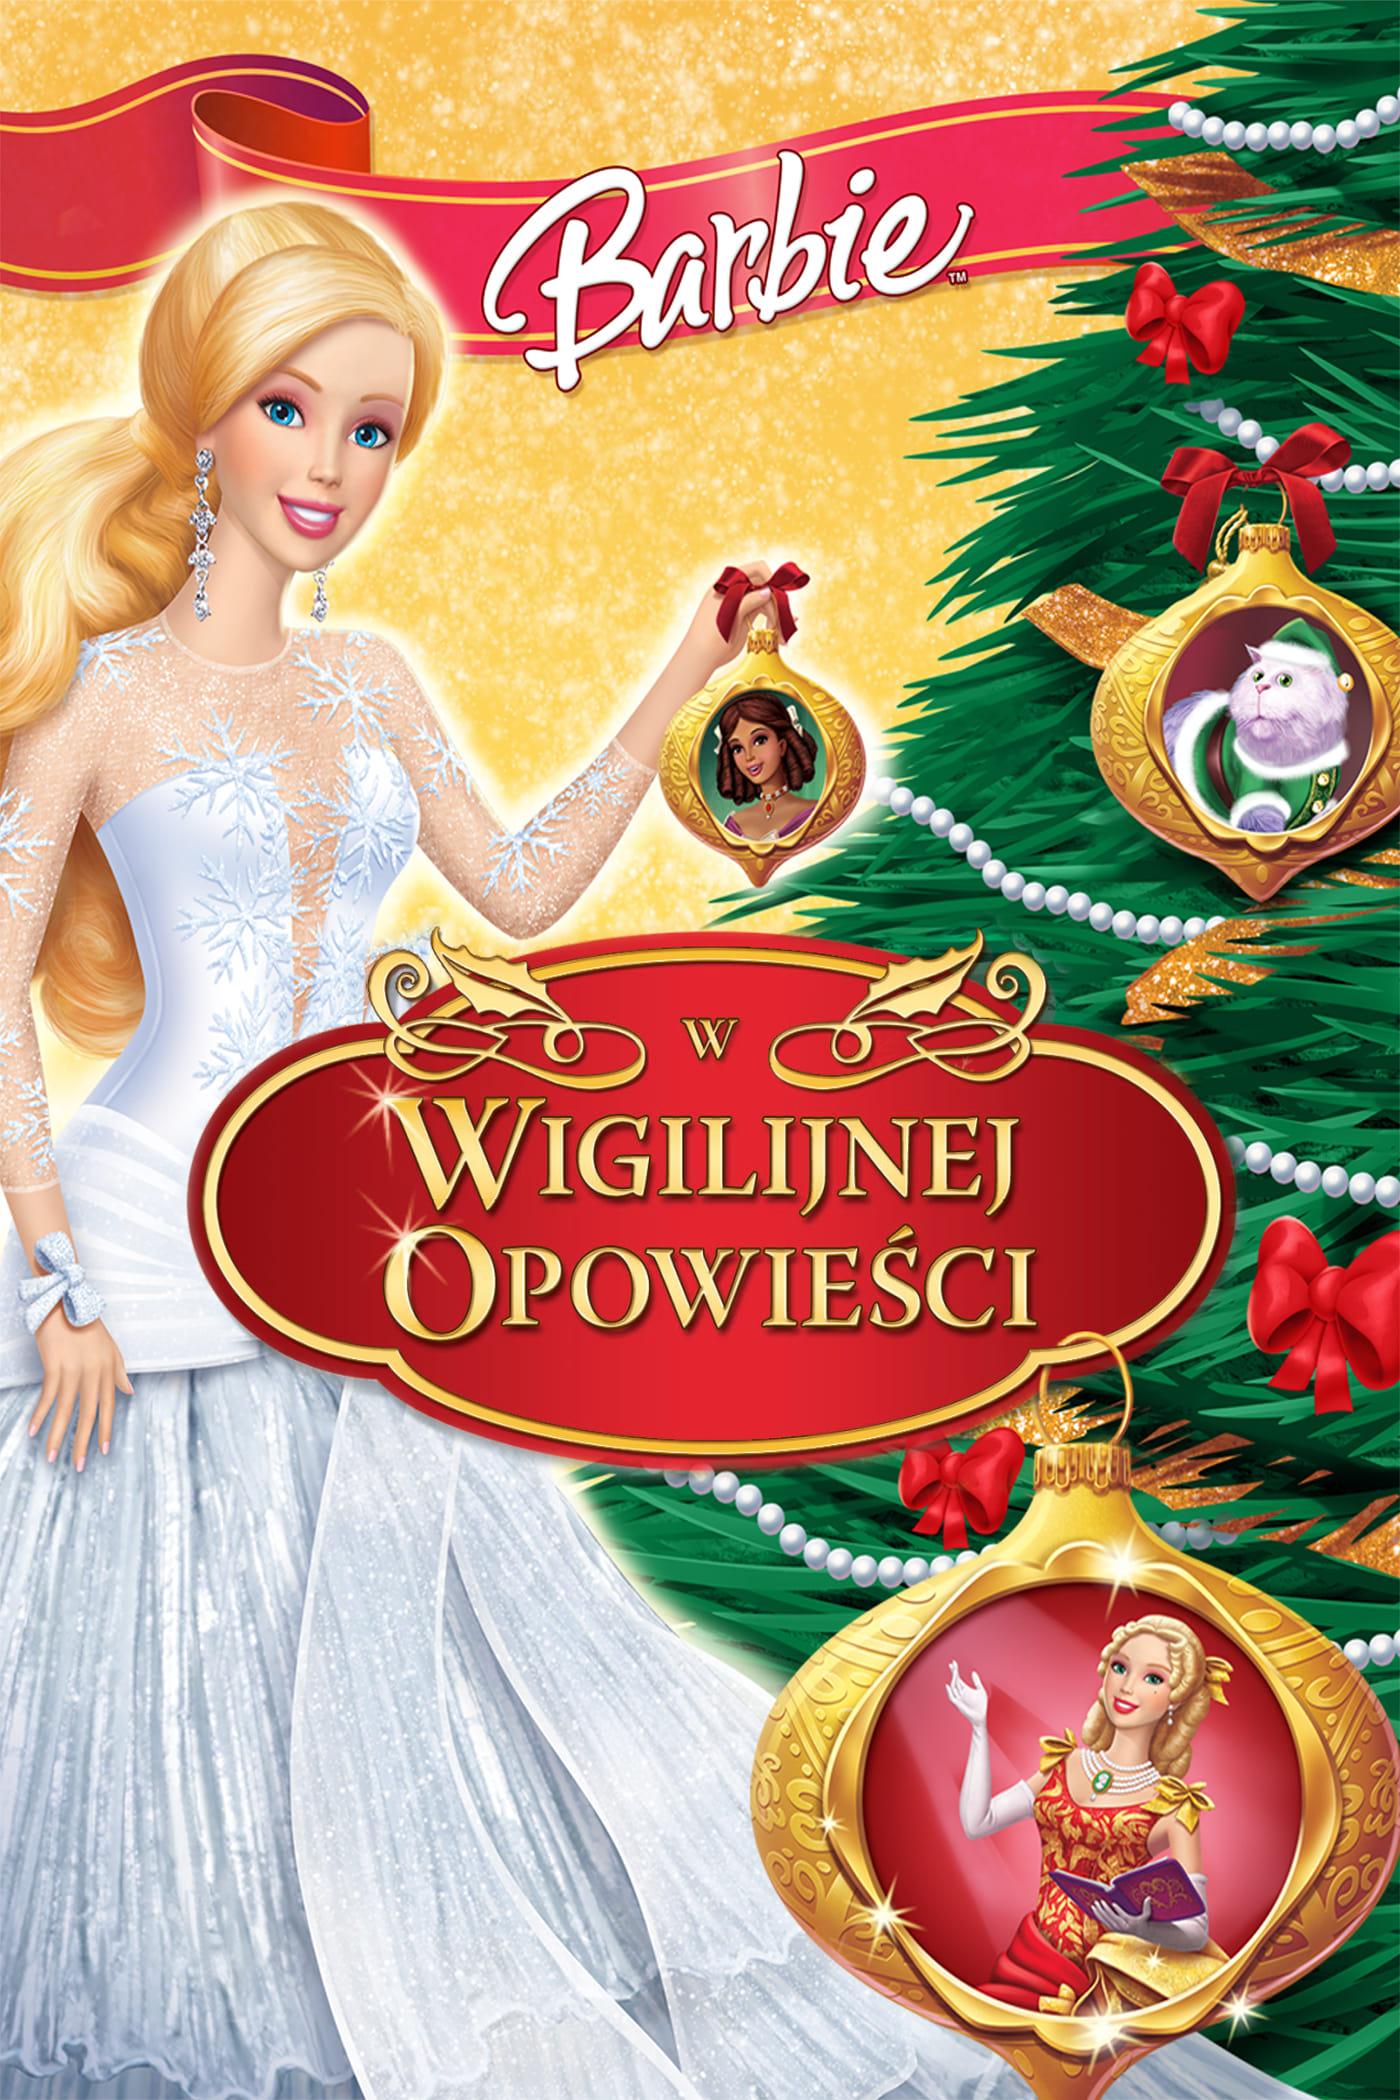 Barbie in 'A Christmas Carol' - 123movies | Watch Online Full Movies TV Series | Gomovies ...